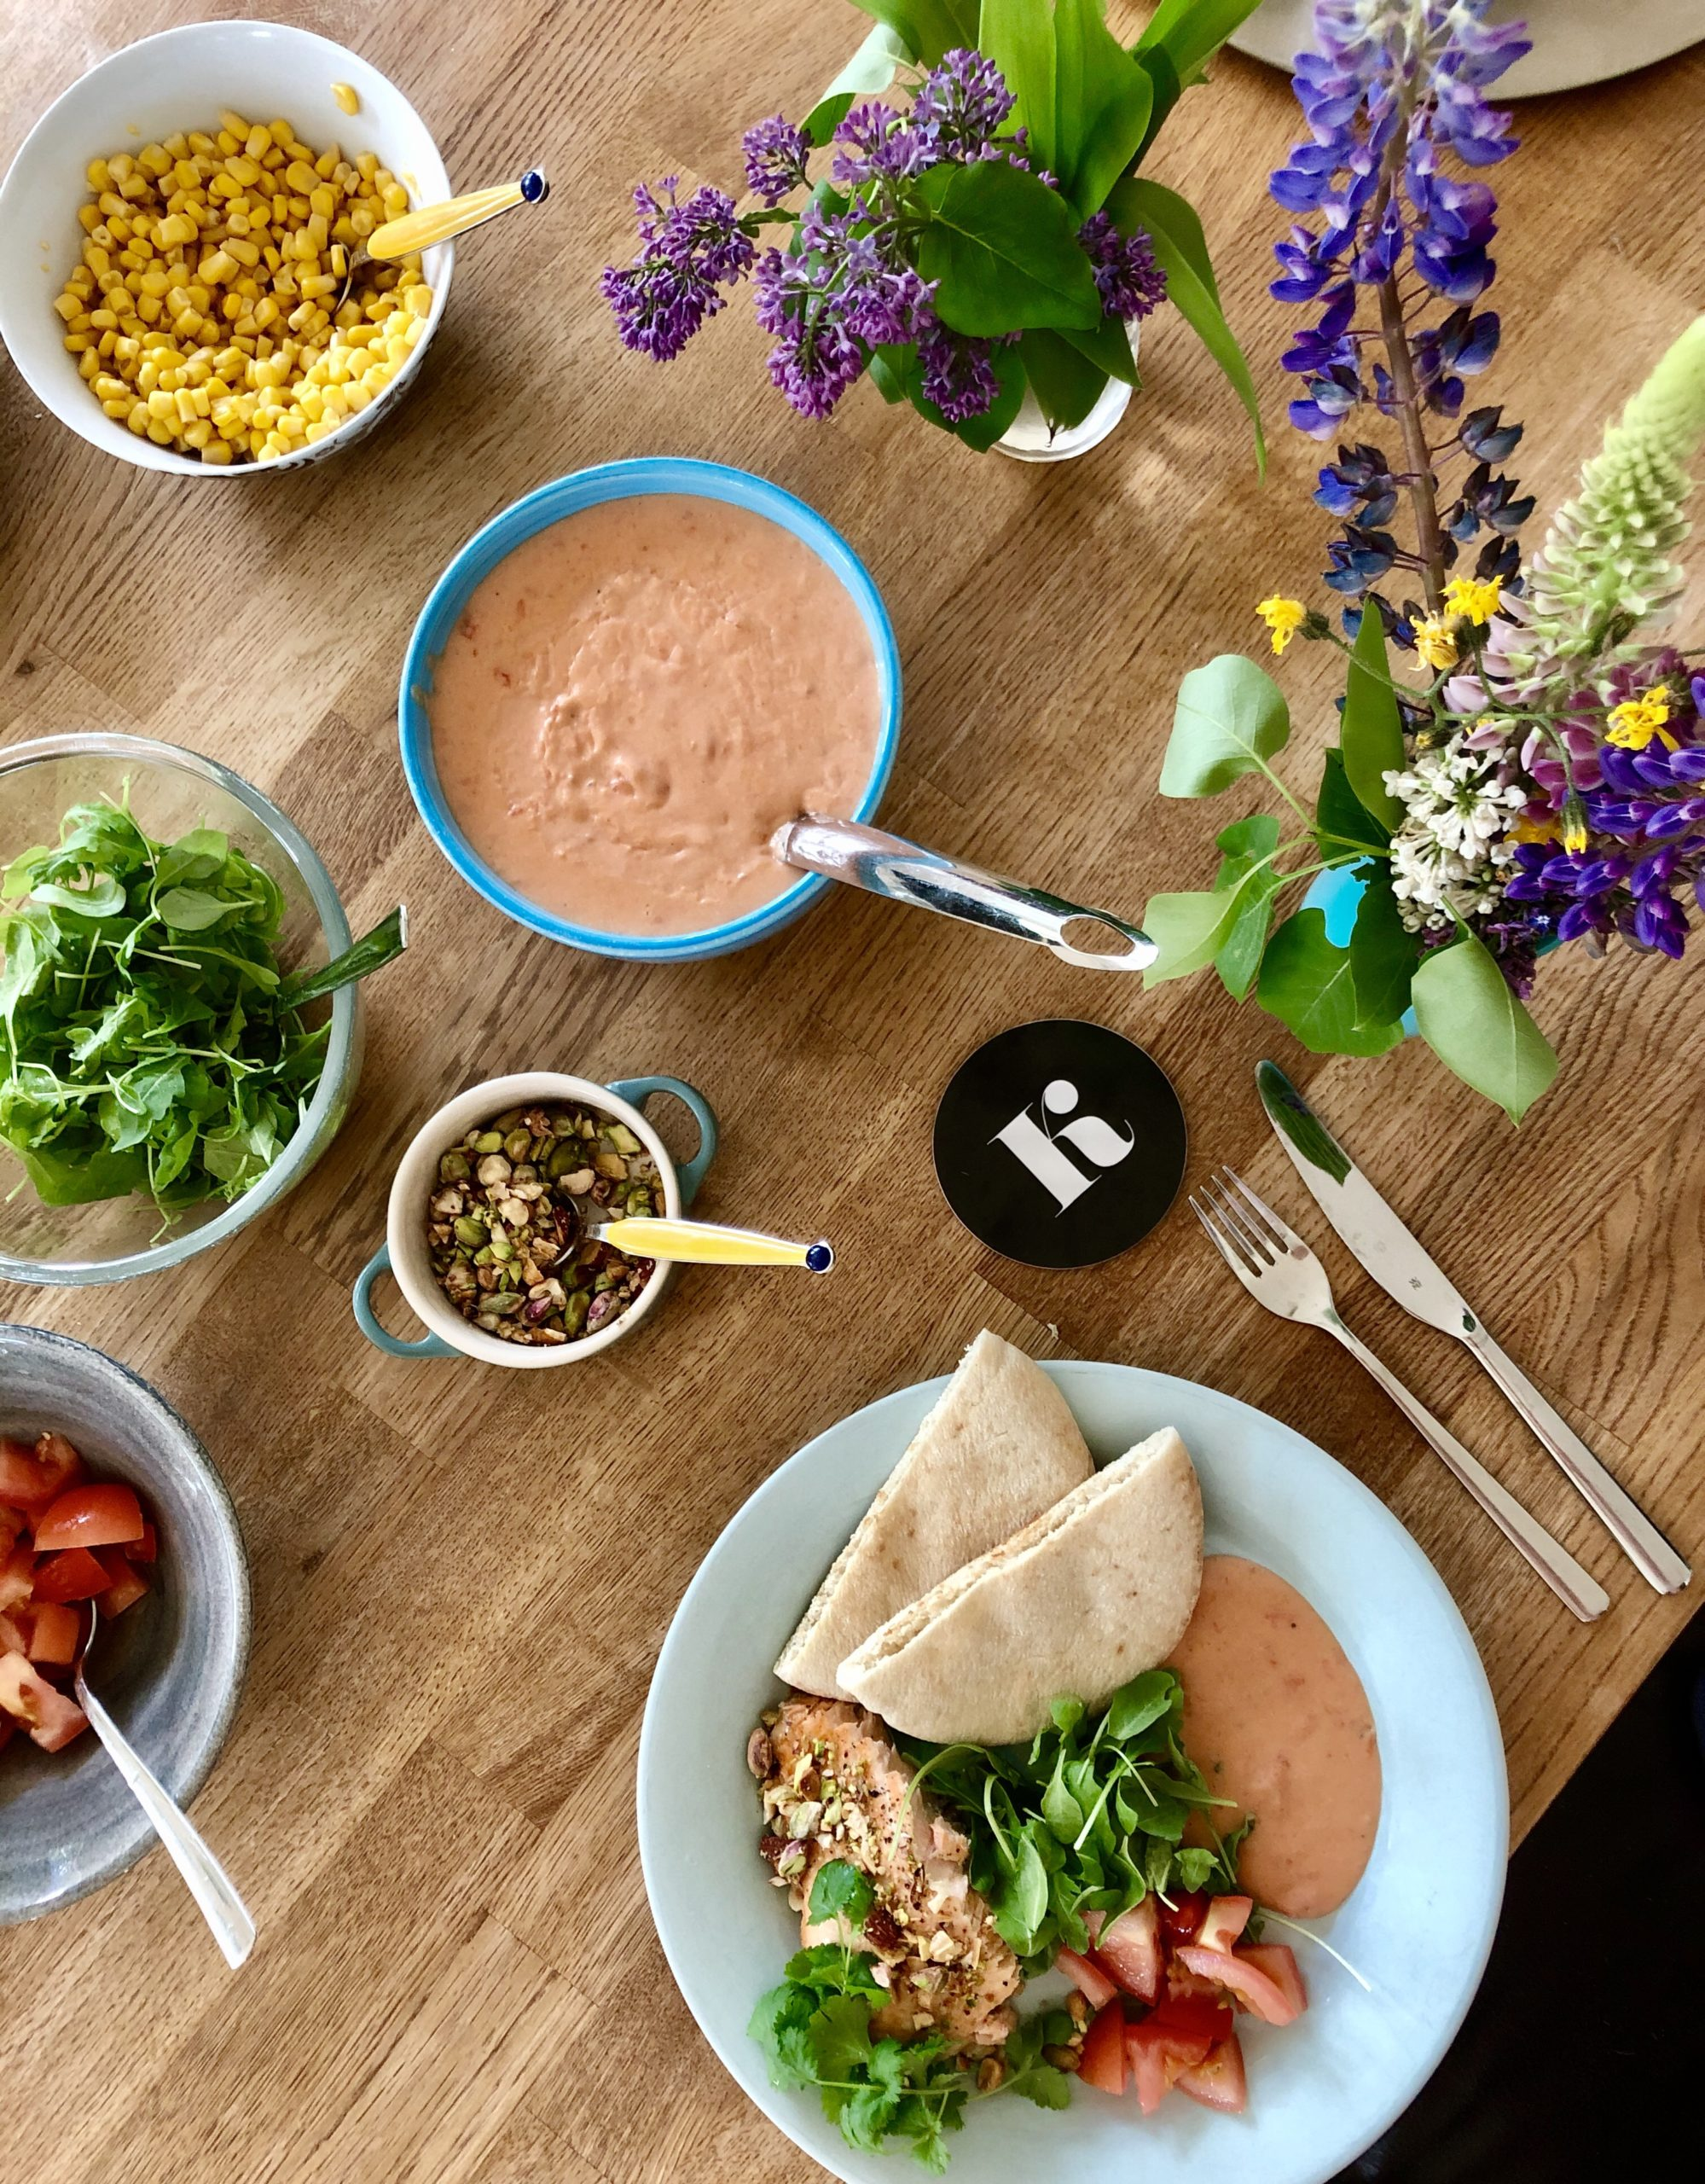 Enkel vardagsmat - Lax med jordnötssås